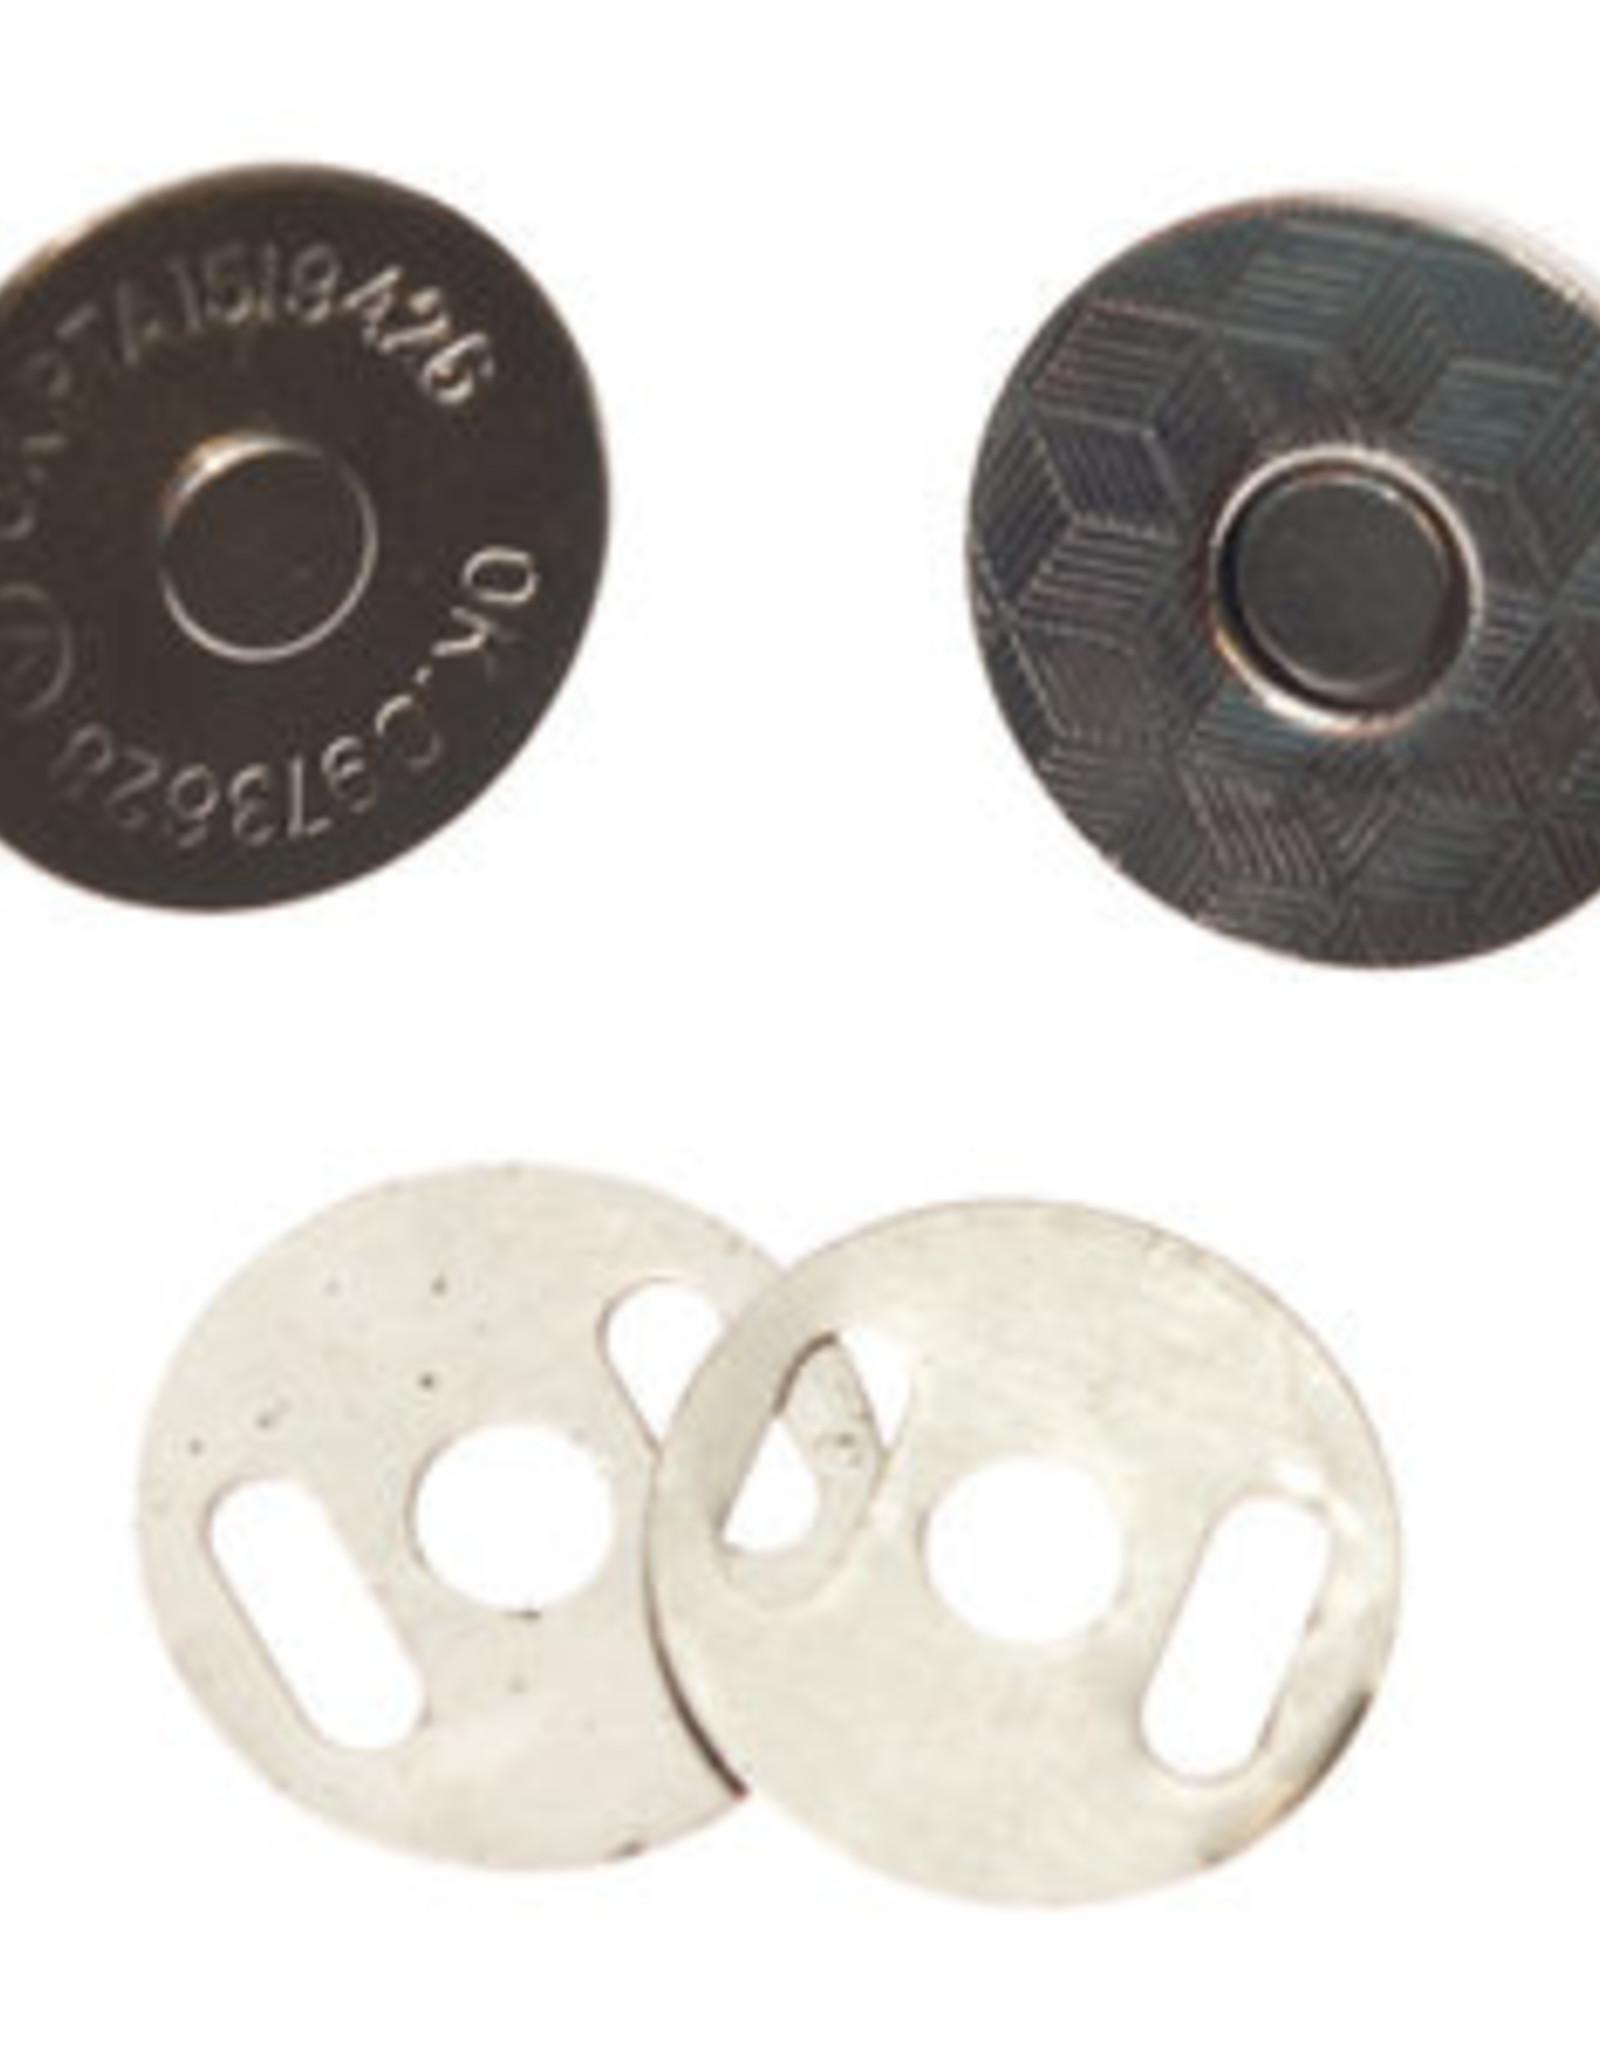 Magneetsluiting zilver 18mm extra plat en extra stevig